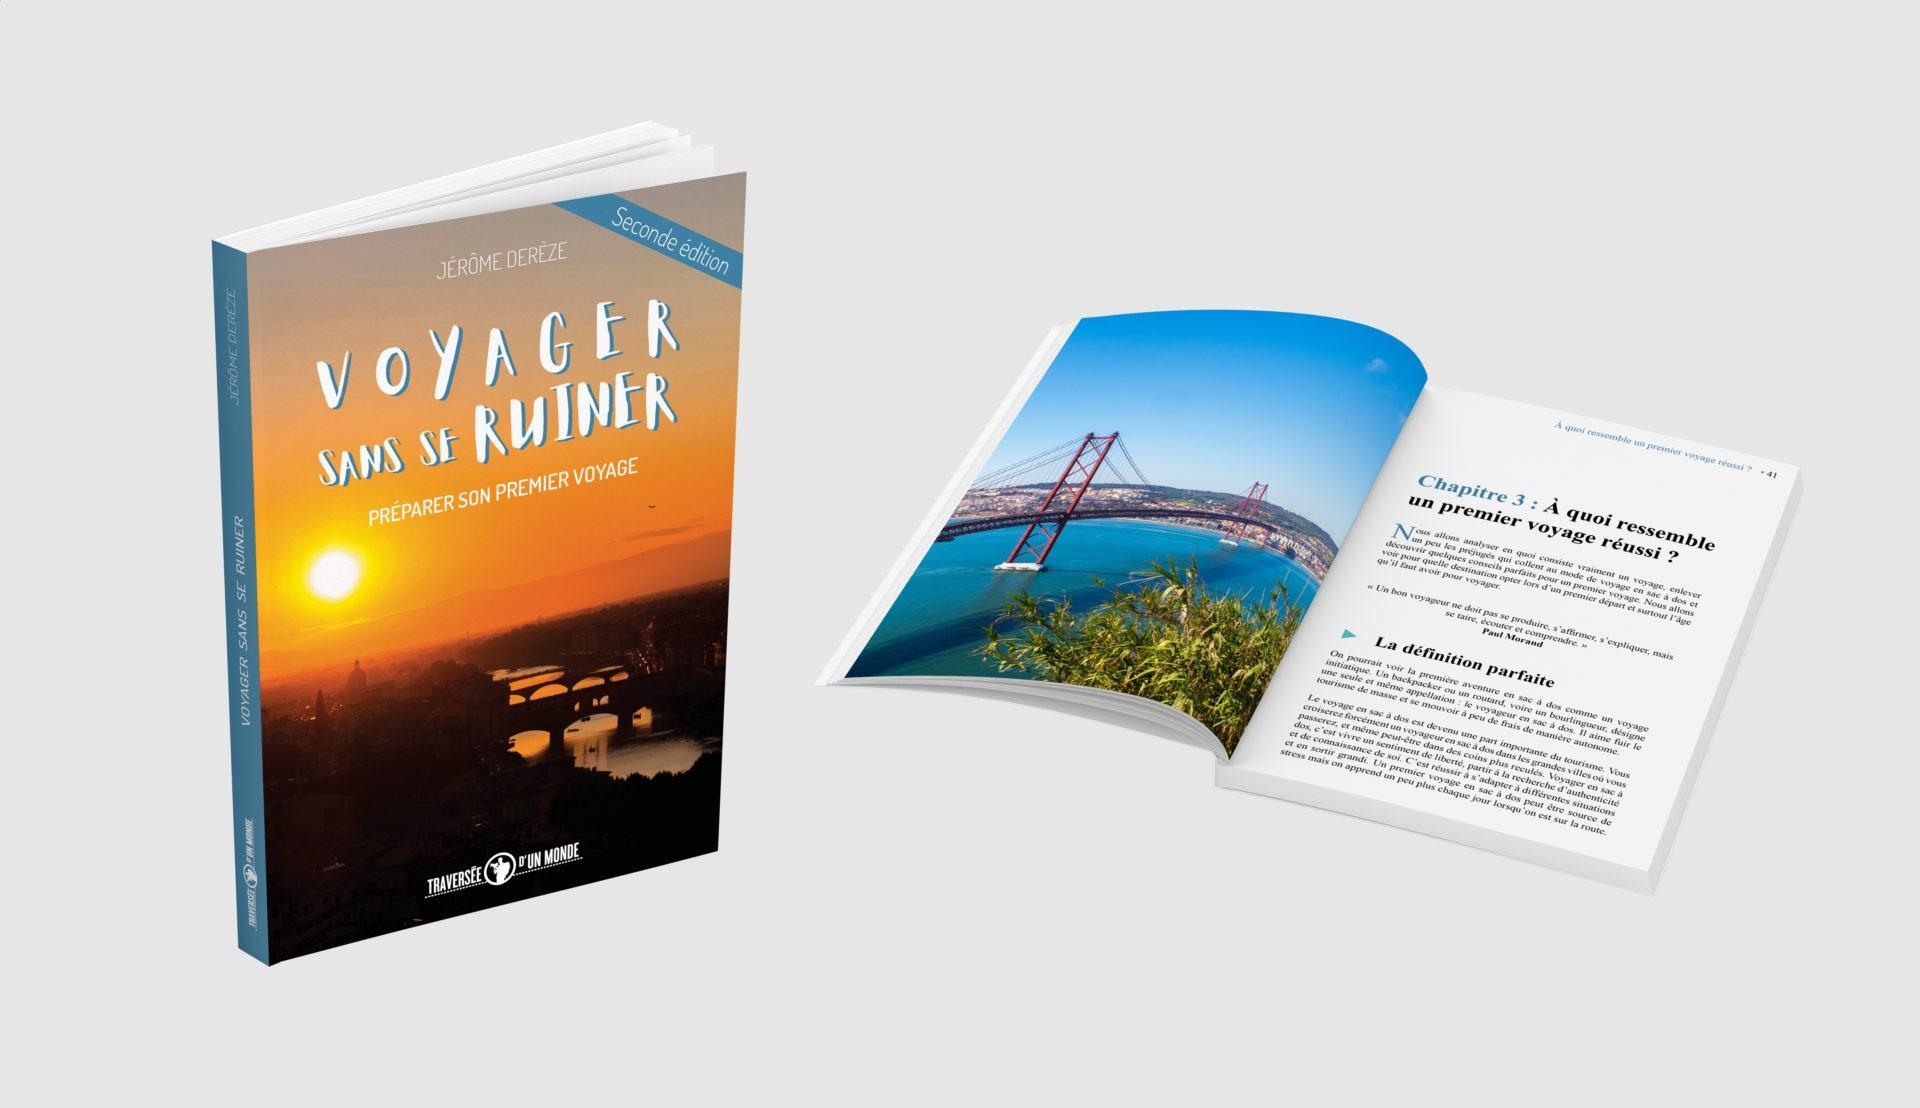 Livre voyager sans se ruiner 2 - Les globe blogueurs - blog voyage nature